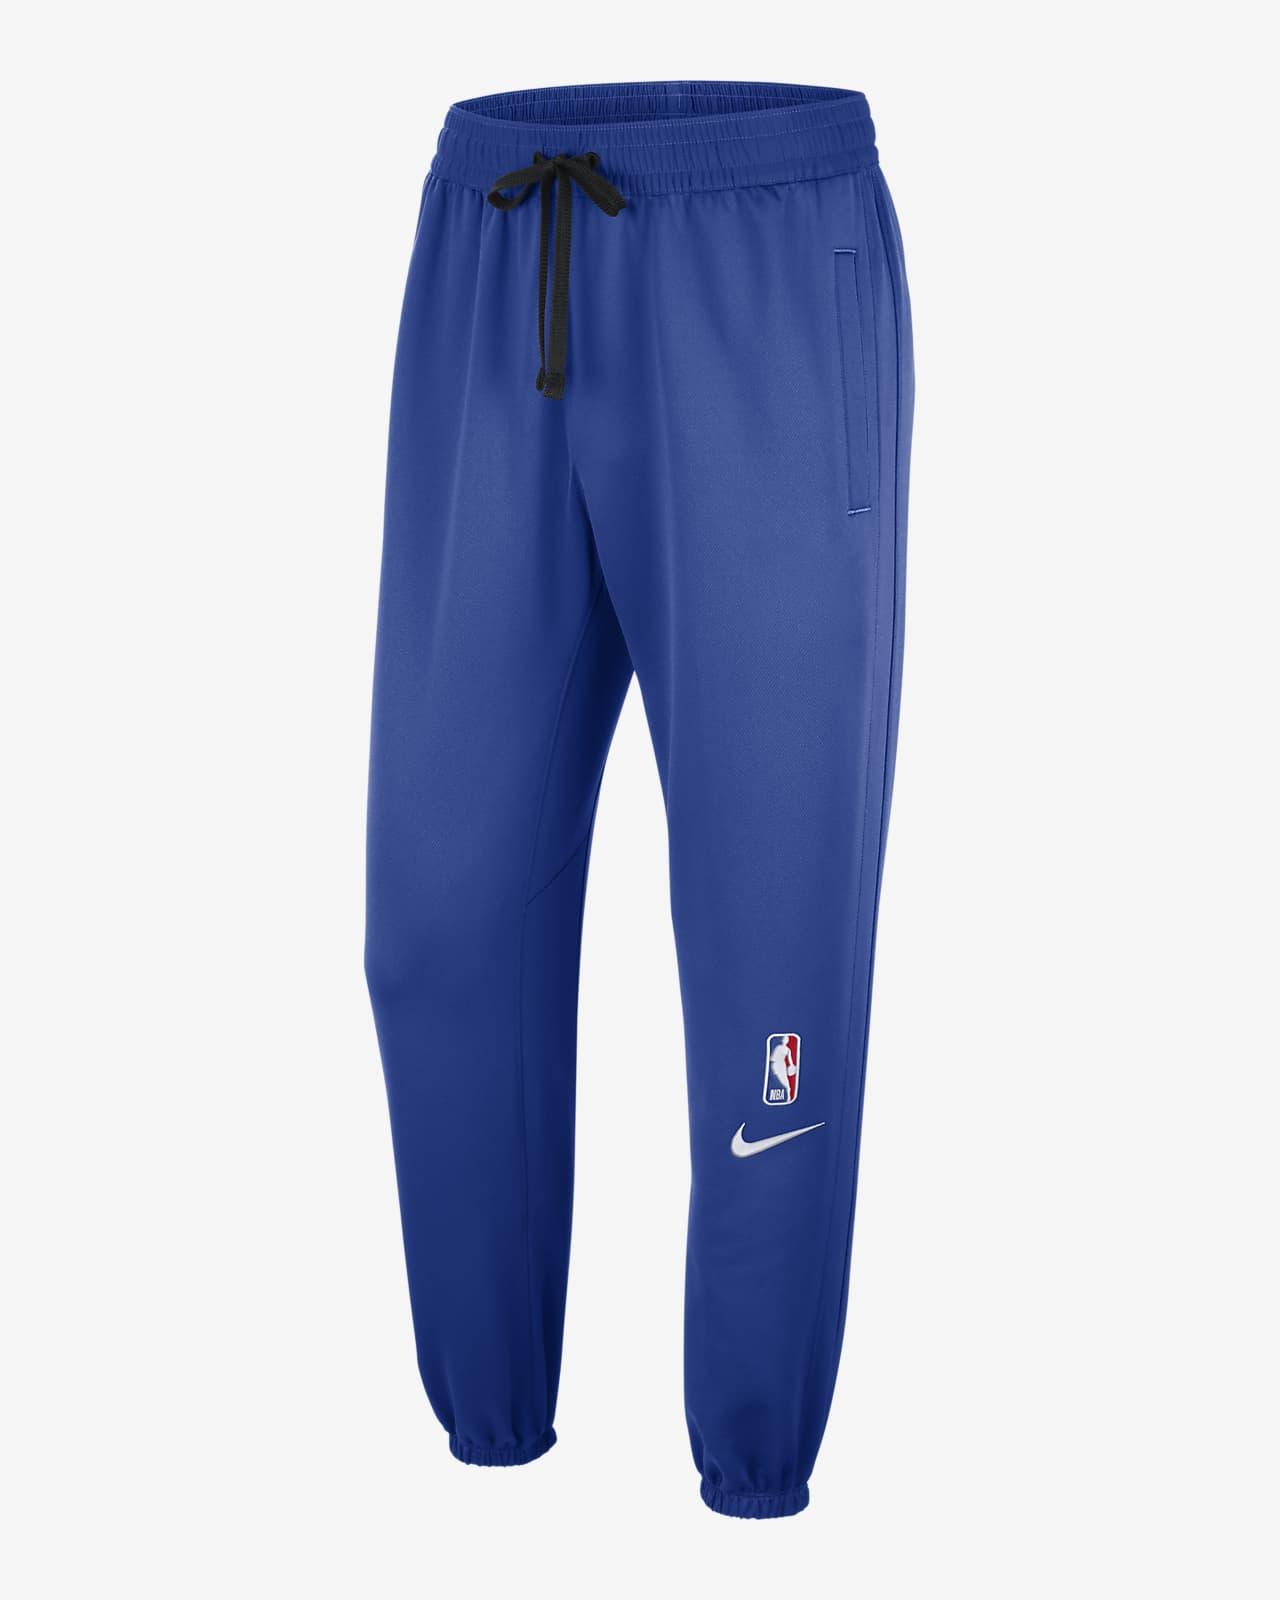 Pantalones de la NBA Nike Therma Flex para hombre Philadelphia 76ers Showtime